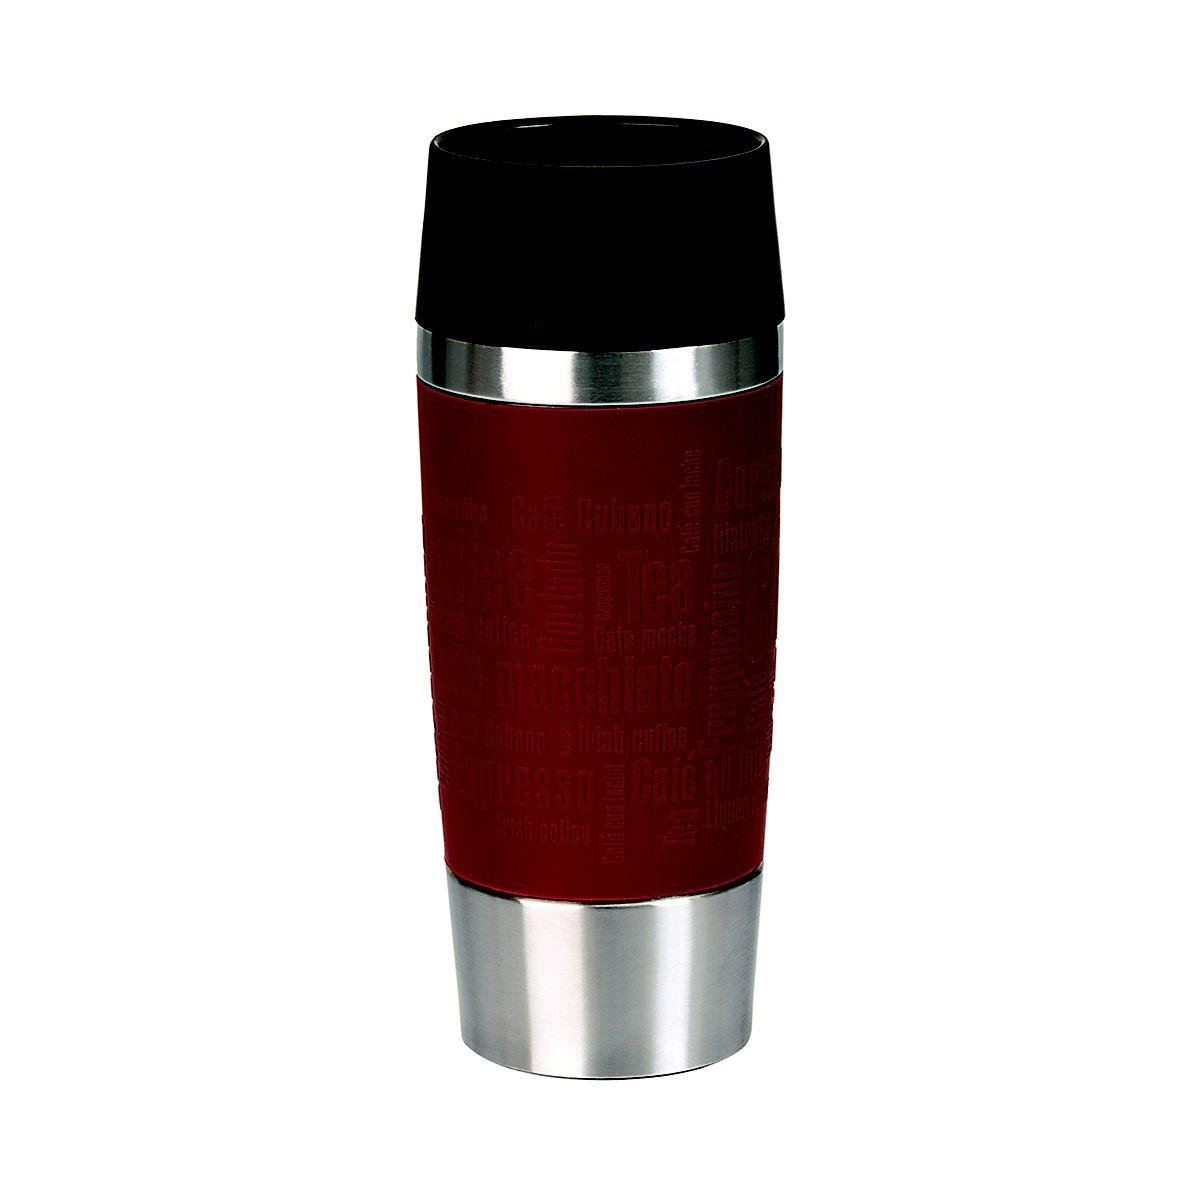 Mug emsa isotherme 0.36l inox/rouge - 20% de remise immédiate avec le code : cash20 (photo)